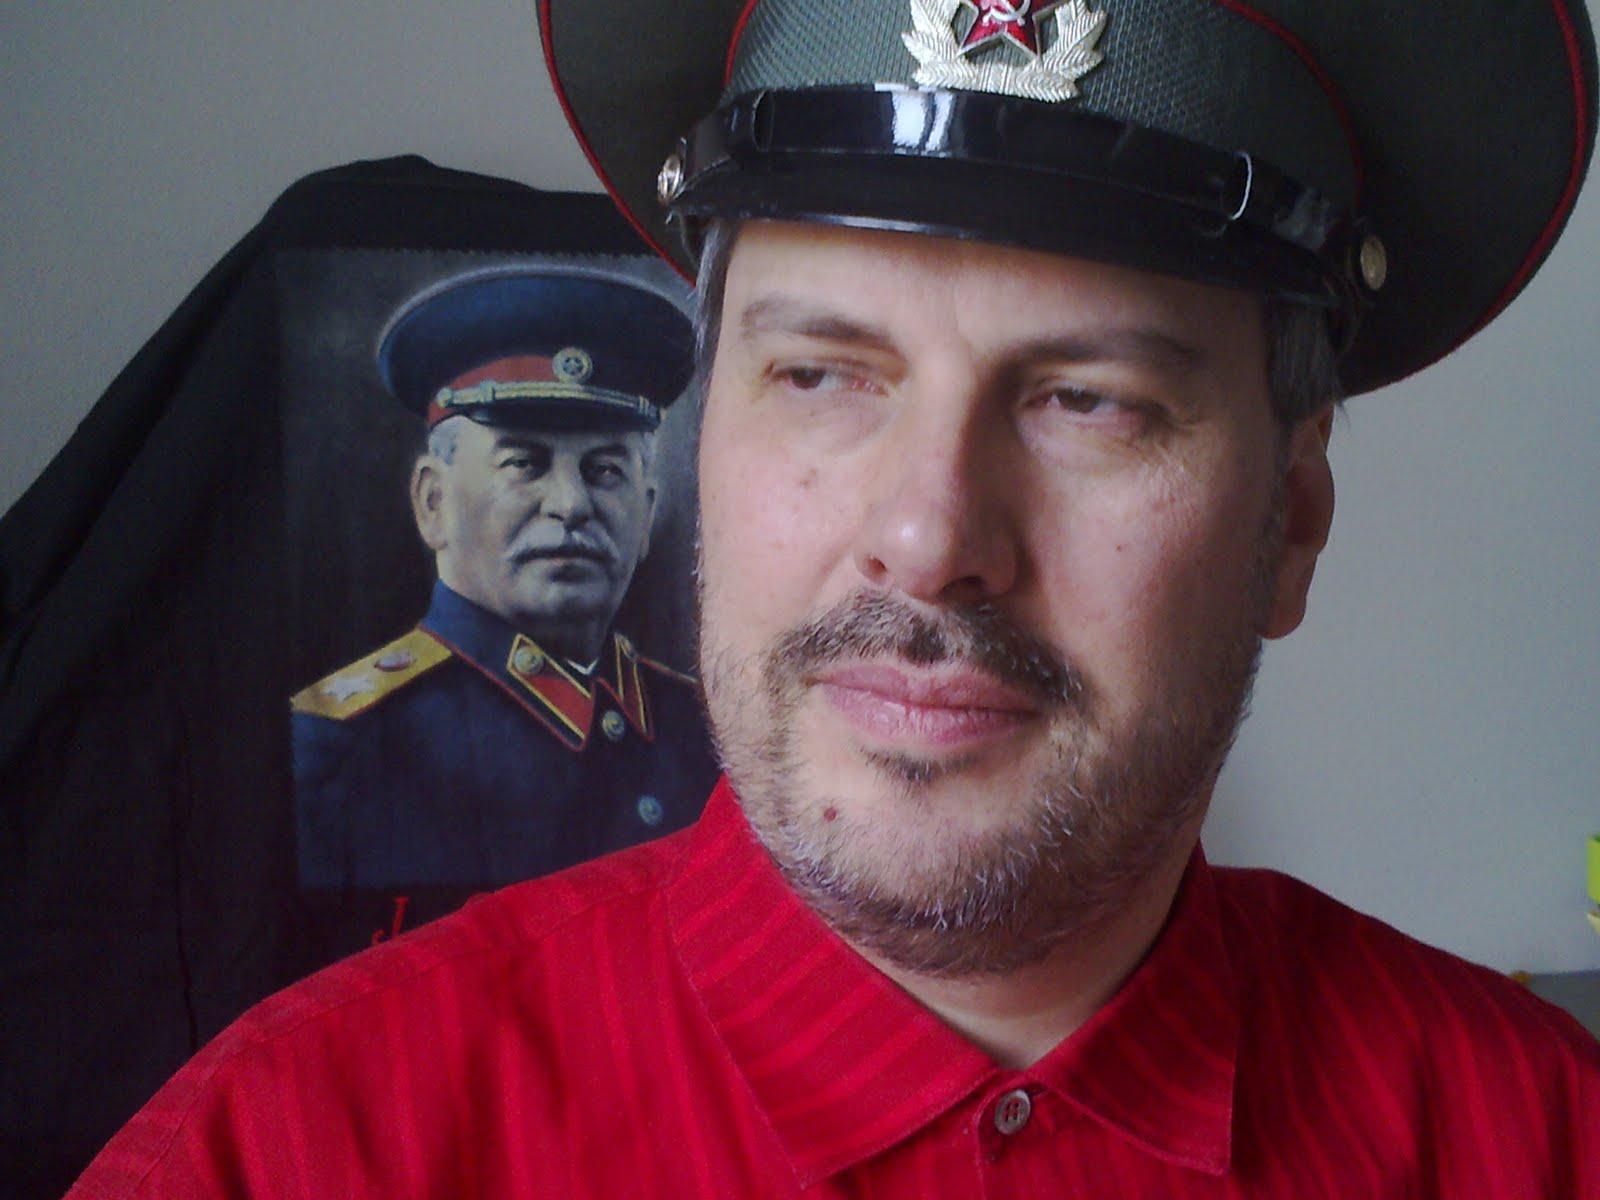 Bäckman's close associate Petri Krohn from his website, Antifacisti Blog